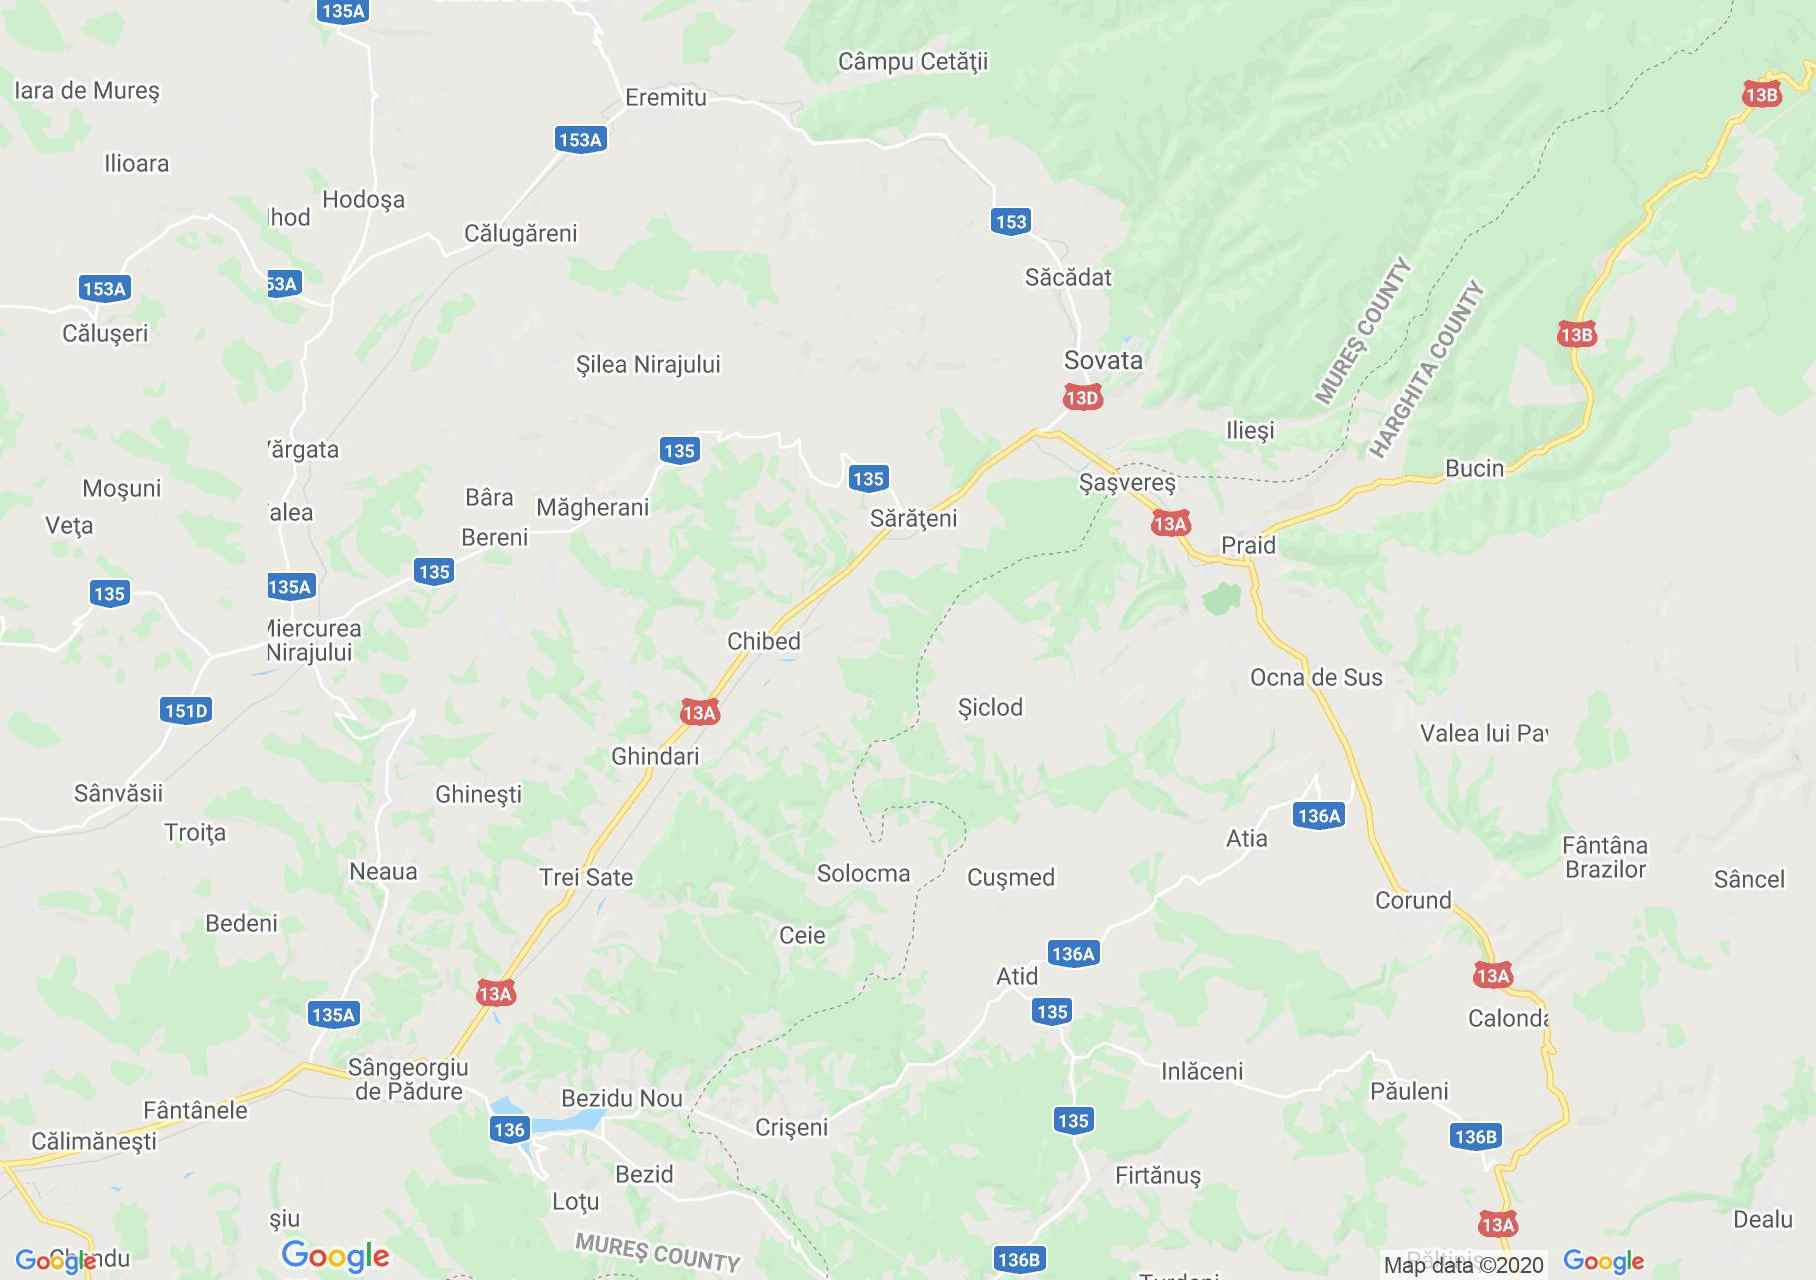 Szováta-Parajd-Korond interaktív turista térképe.